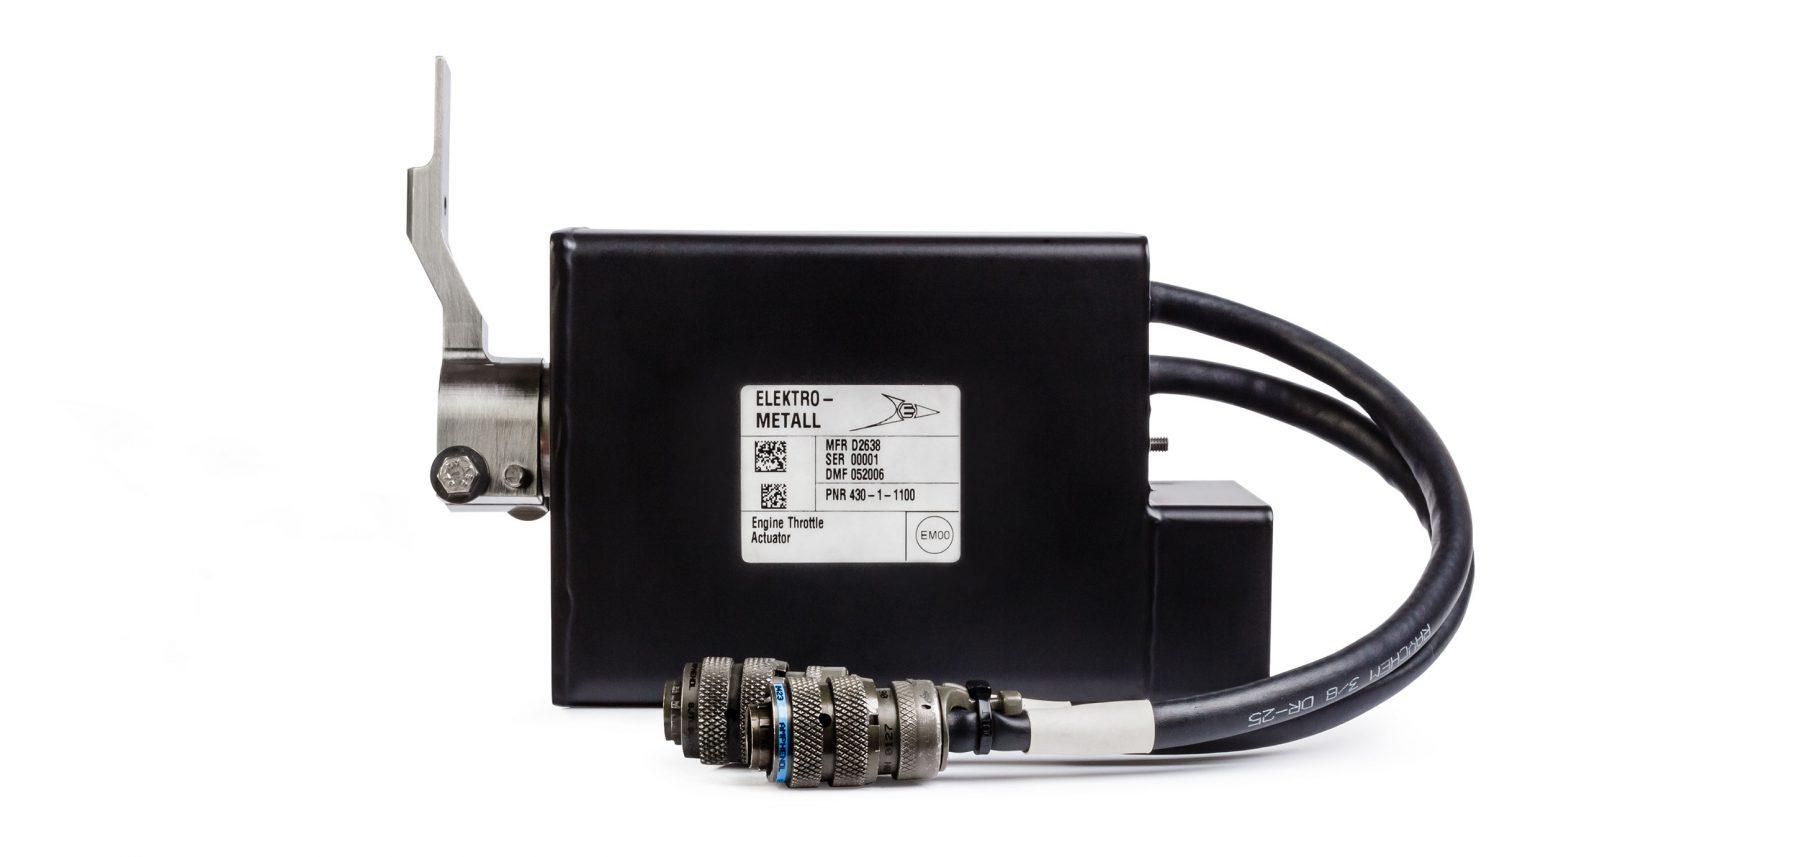 EME Rotary Actuator Engine Throttle Actuator 430-1